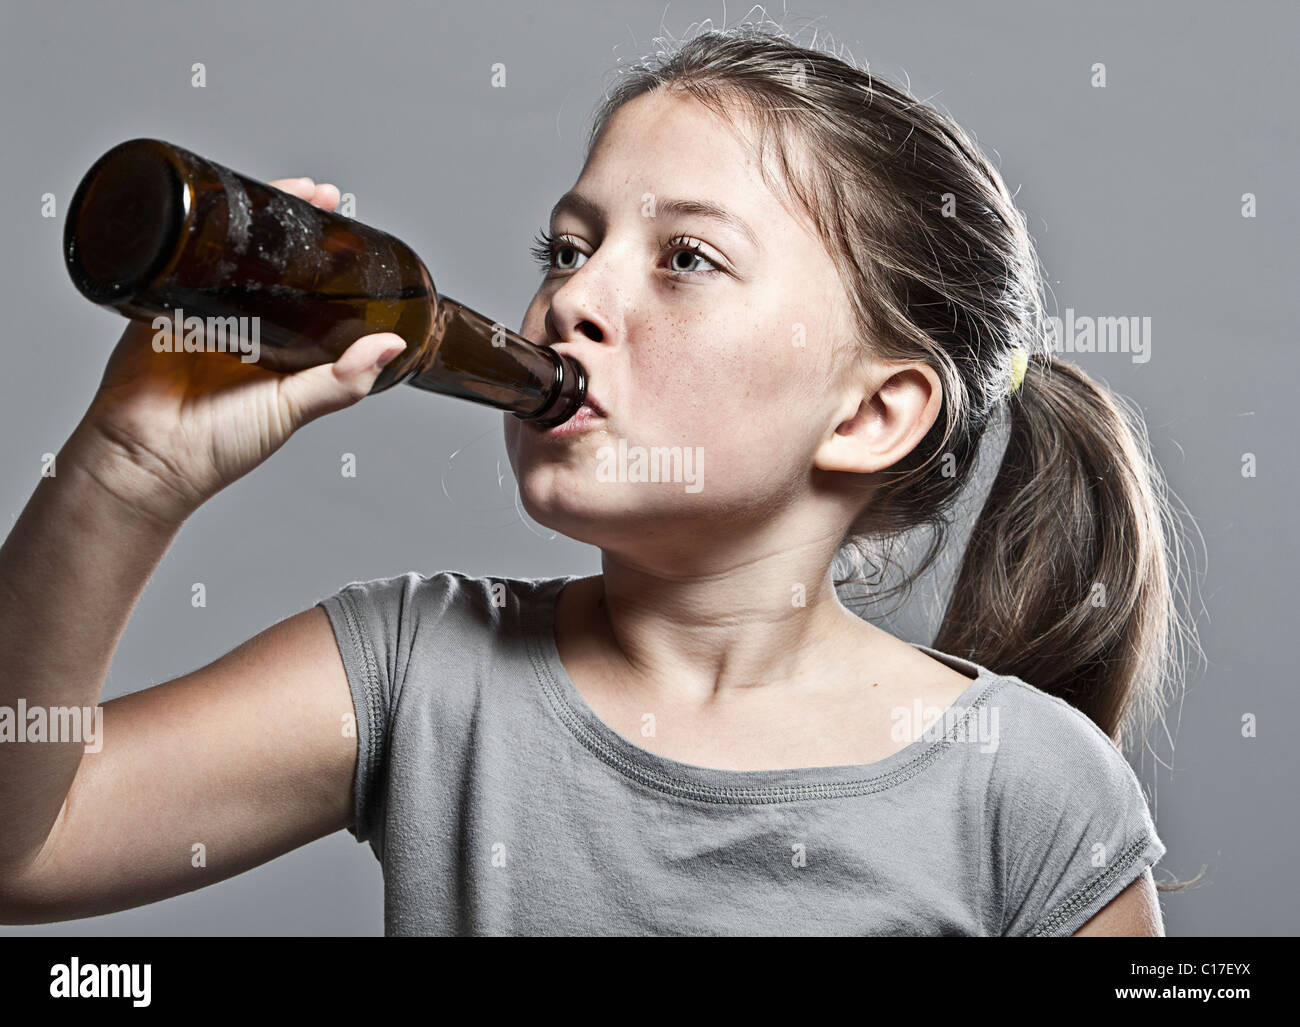 Drinking As Kids Photo 10 Drinking Underage 35200814 Young - Stock Alamy Binge